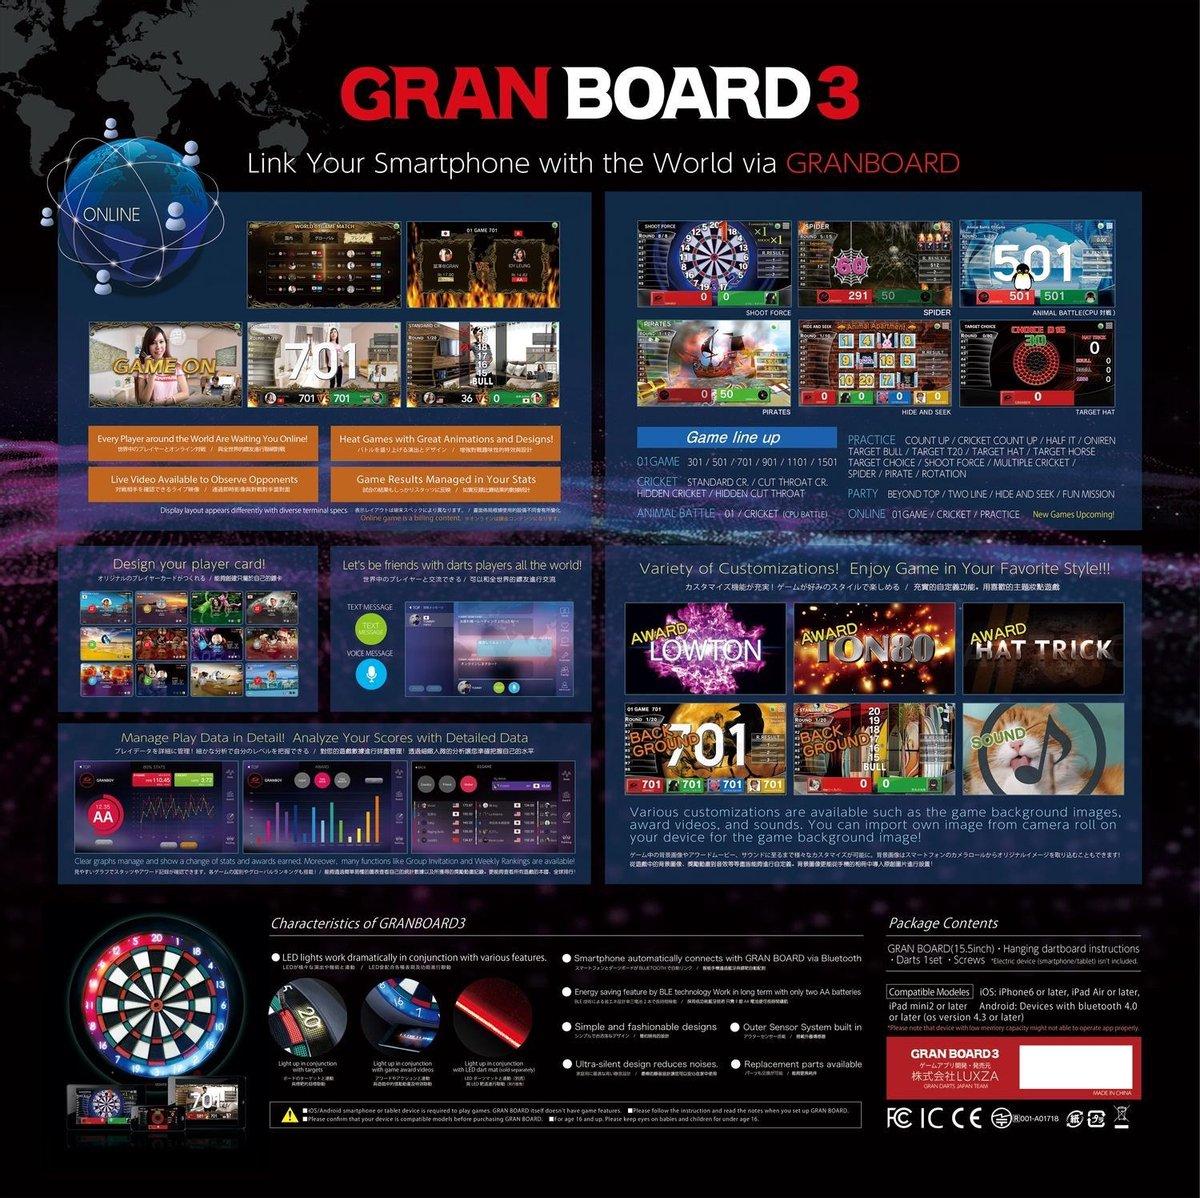 GranBoard 3S Blue Smartboard